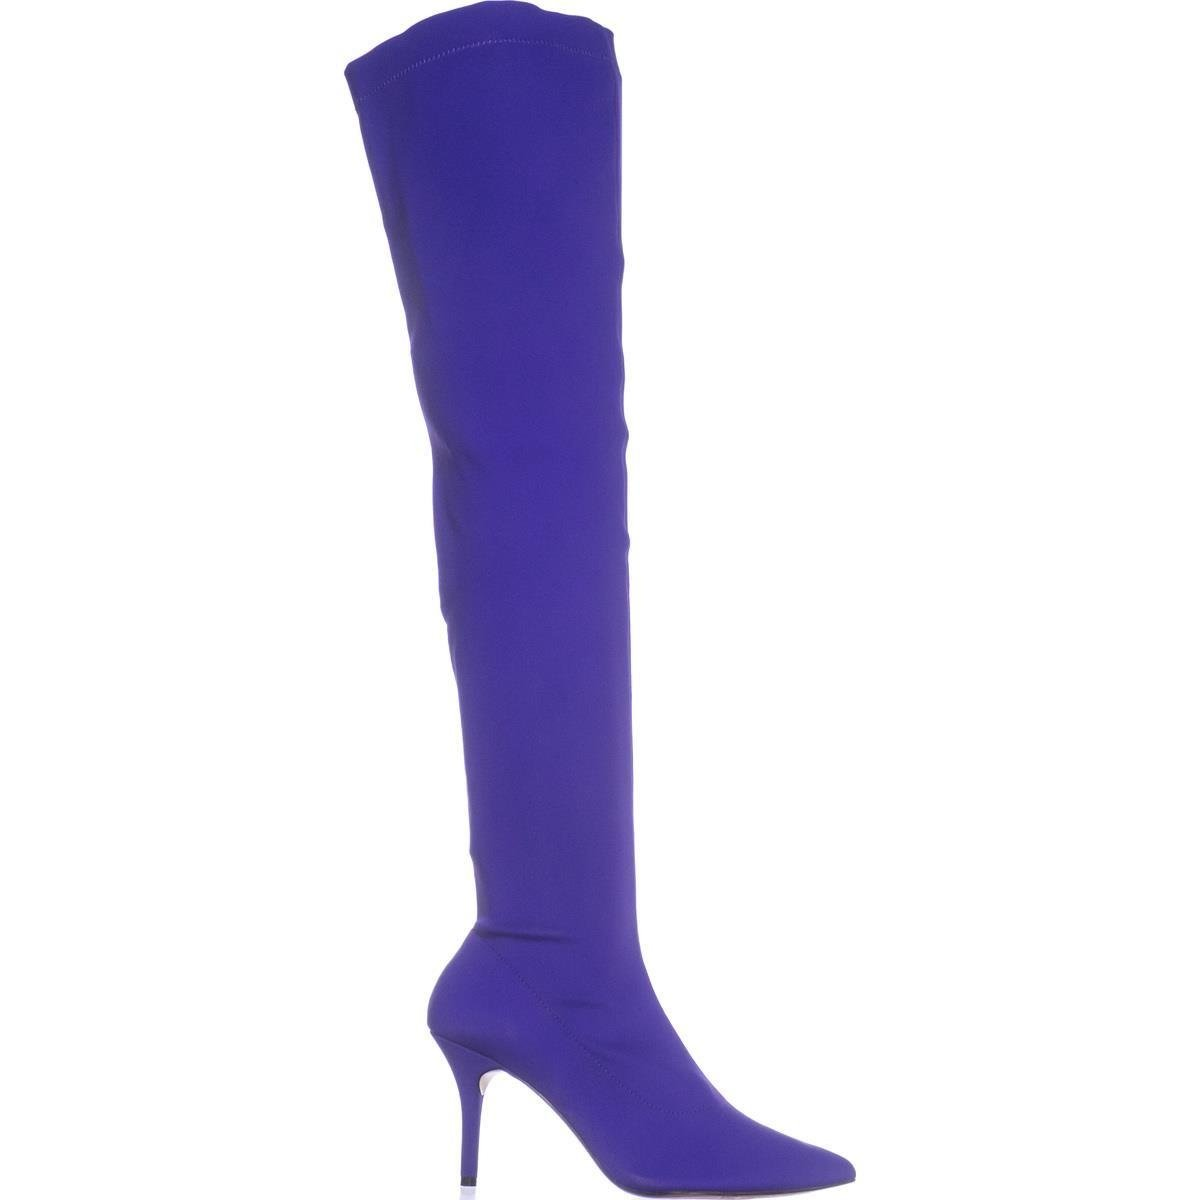 bb38506cc INC International Concepts Womens Zaliaa Pointed Toe Over Knee ...